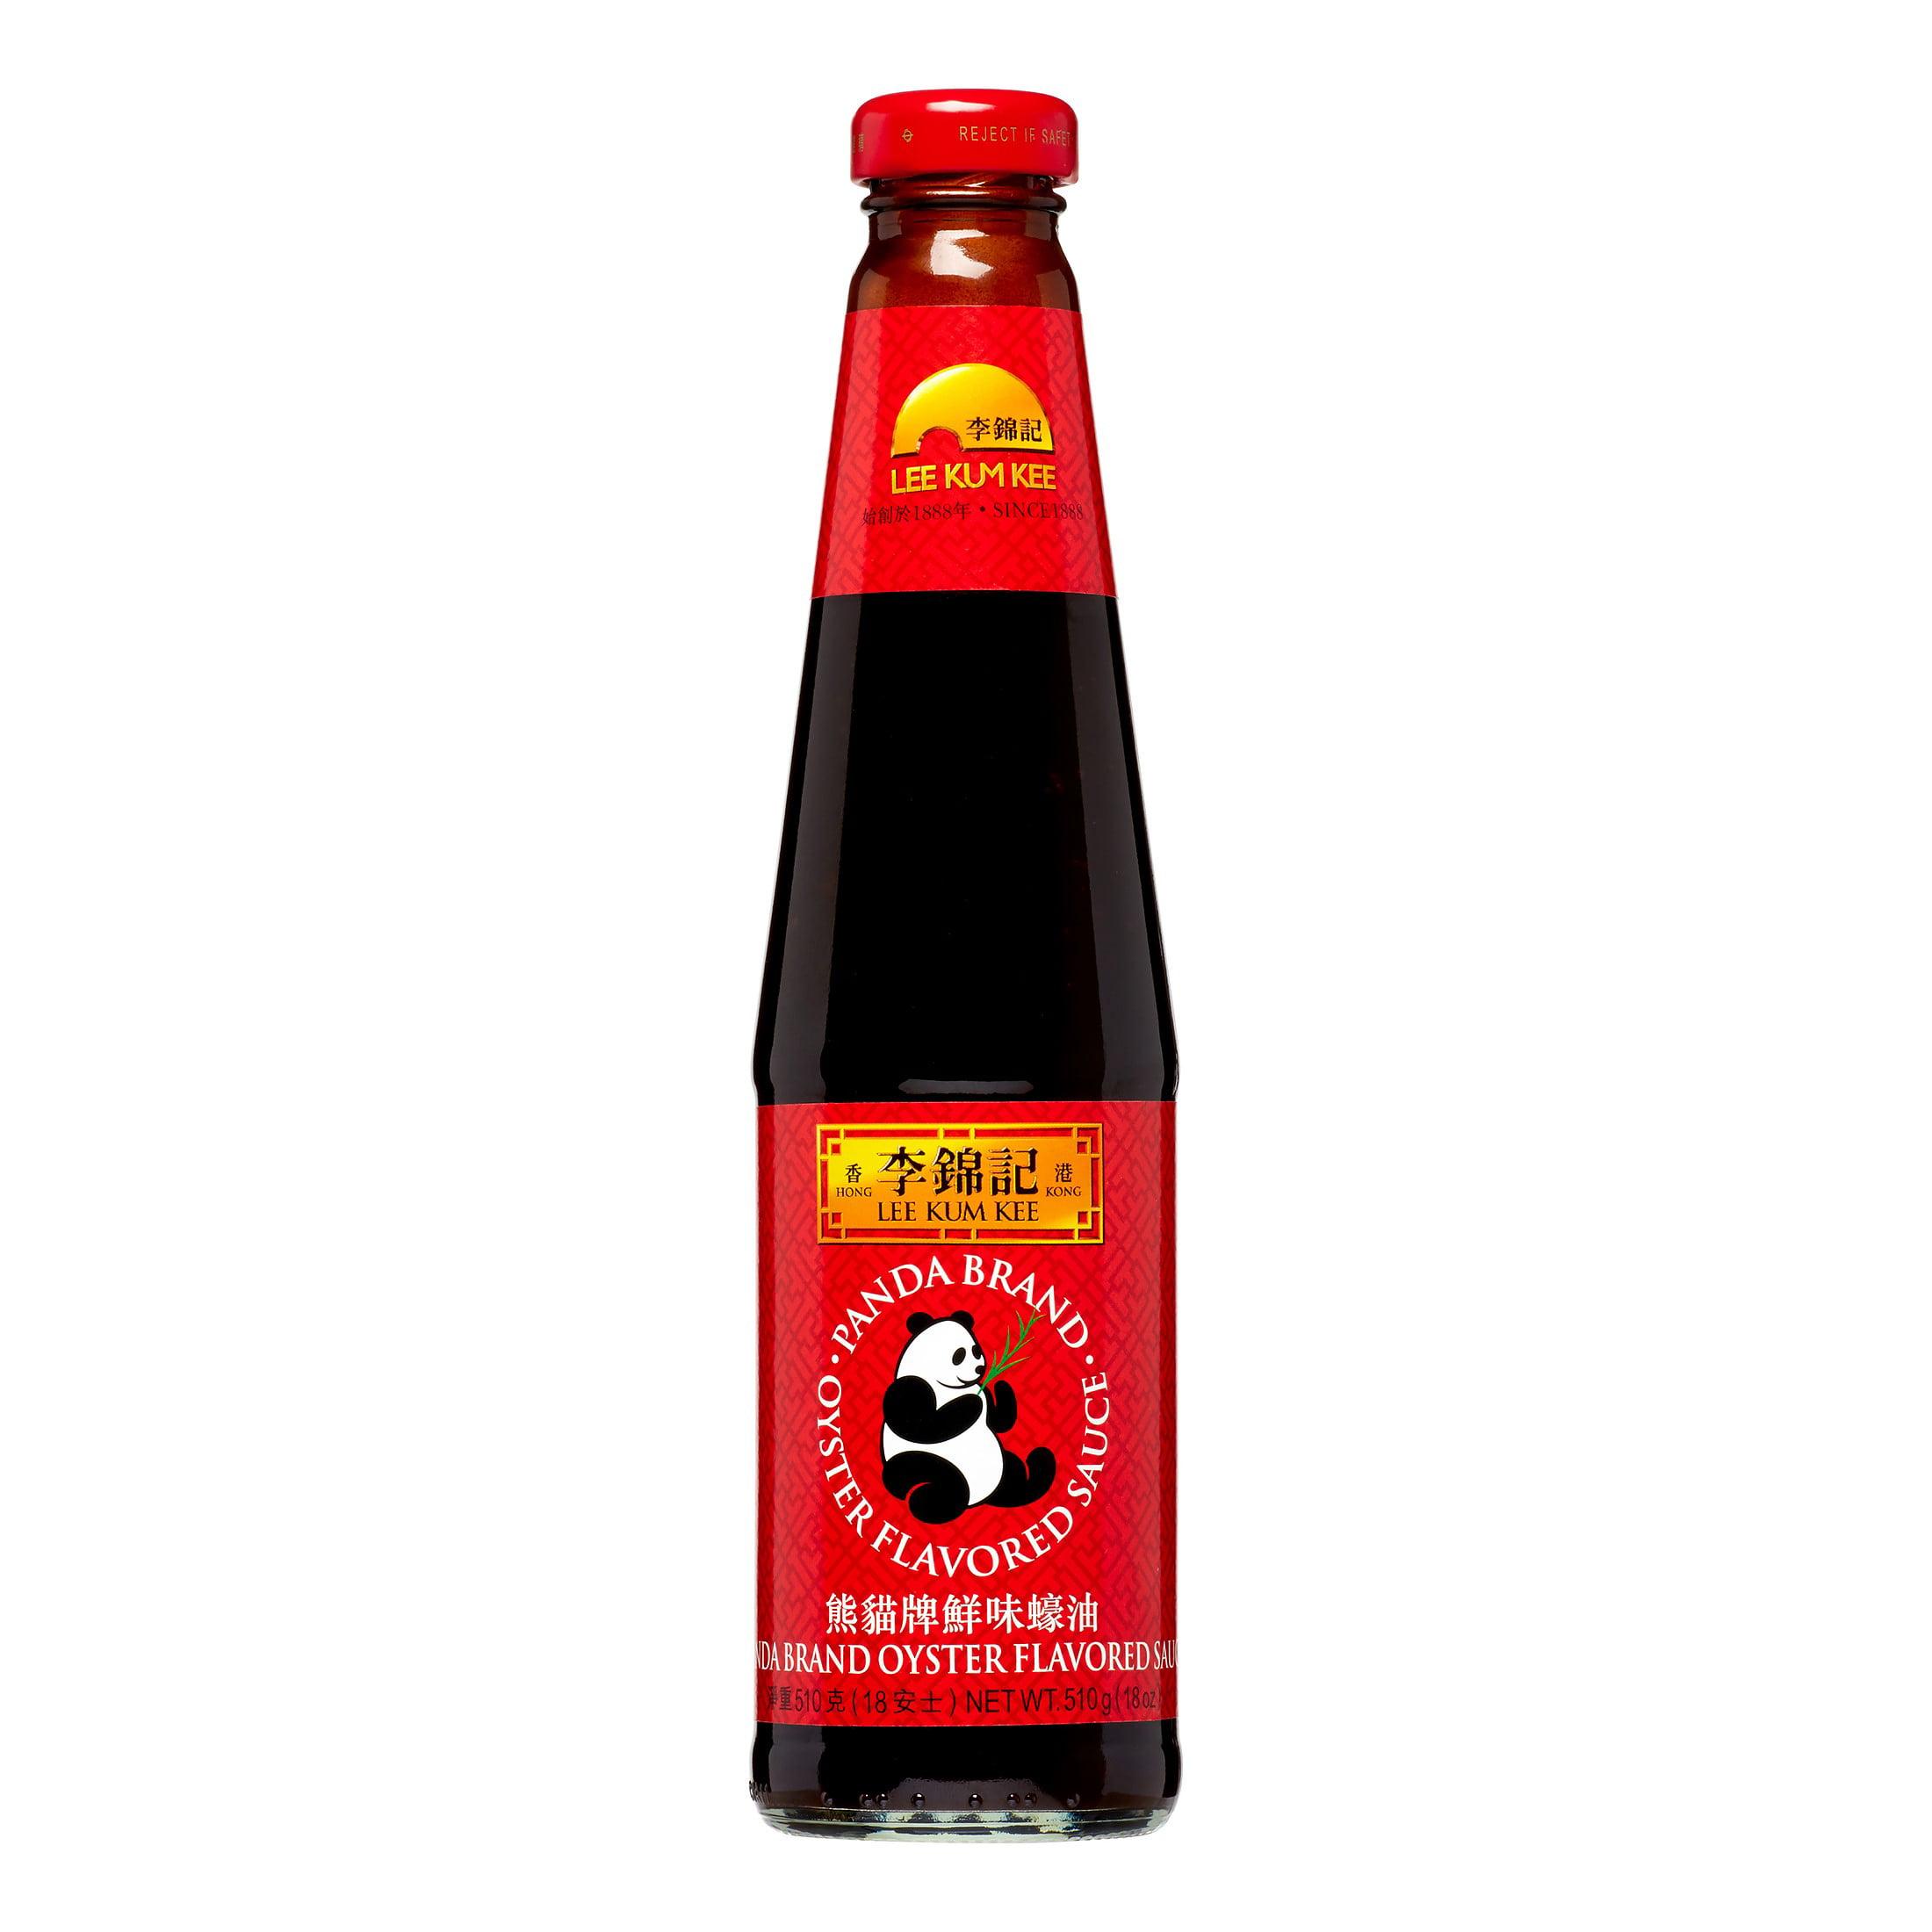 Lee Kum Kee Panda Oyster Sauce, 18 oz